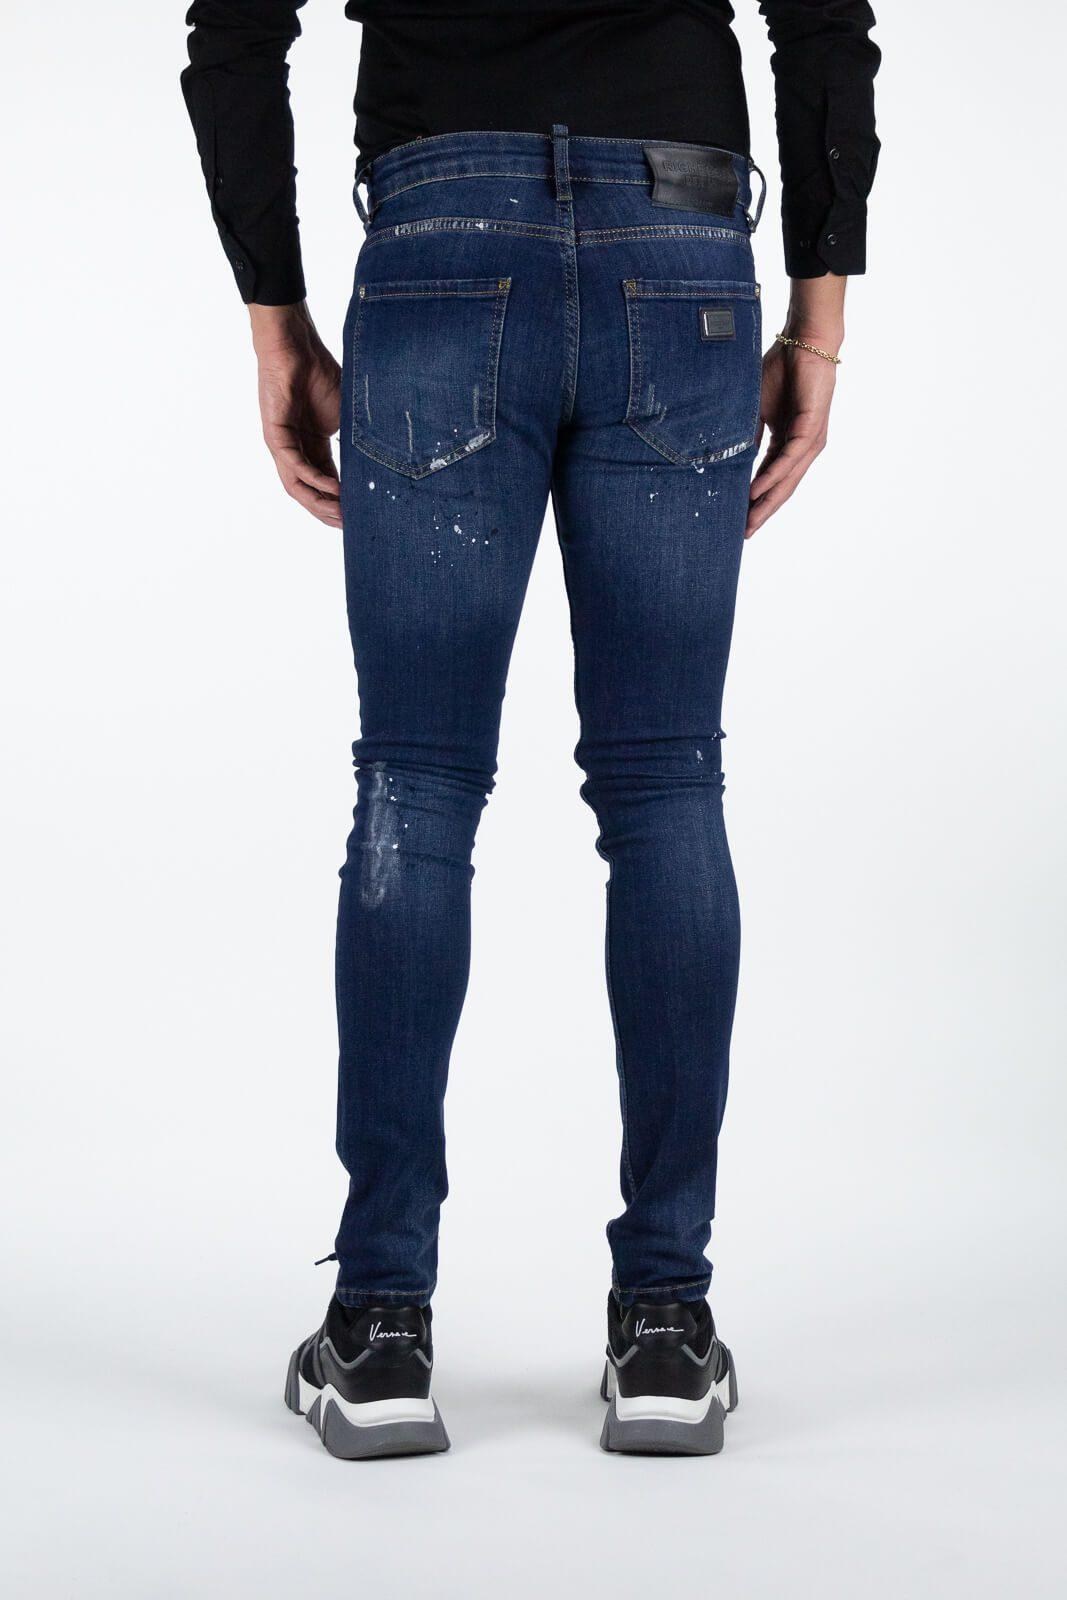 Piura Bleu Jeans-4